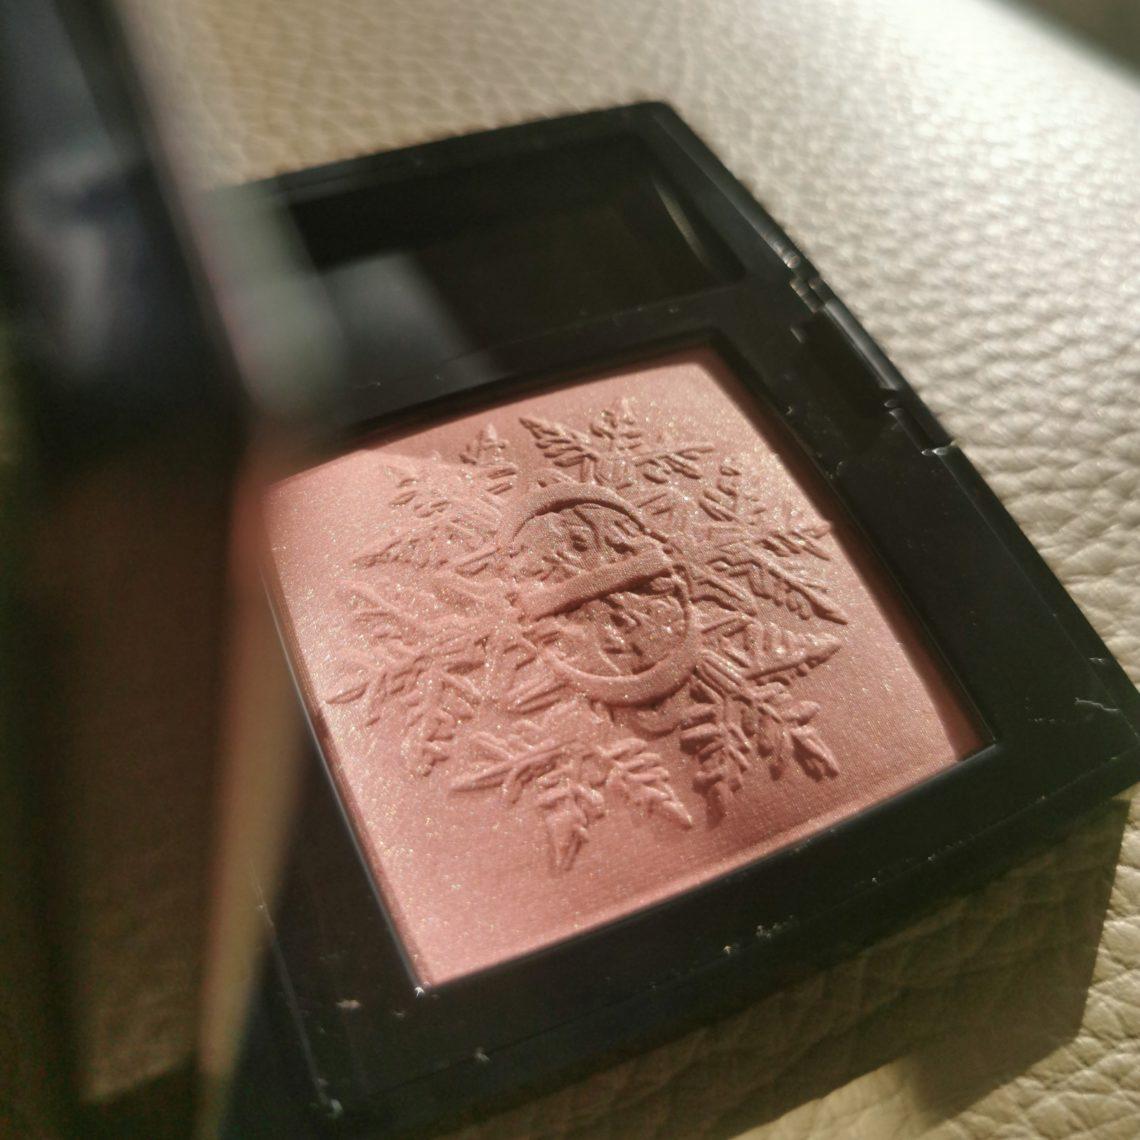 Dior blush 353 Rose Frisson